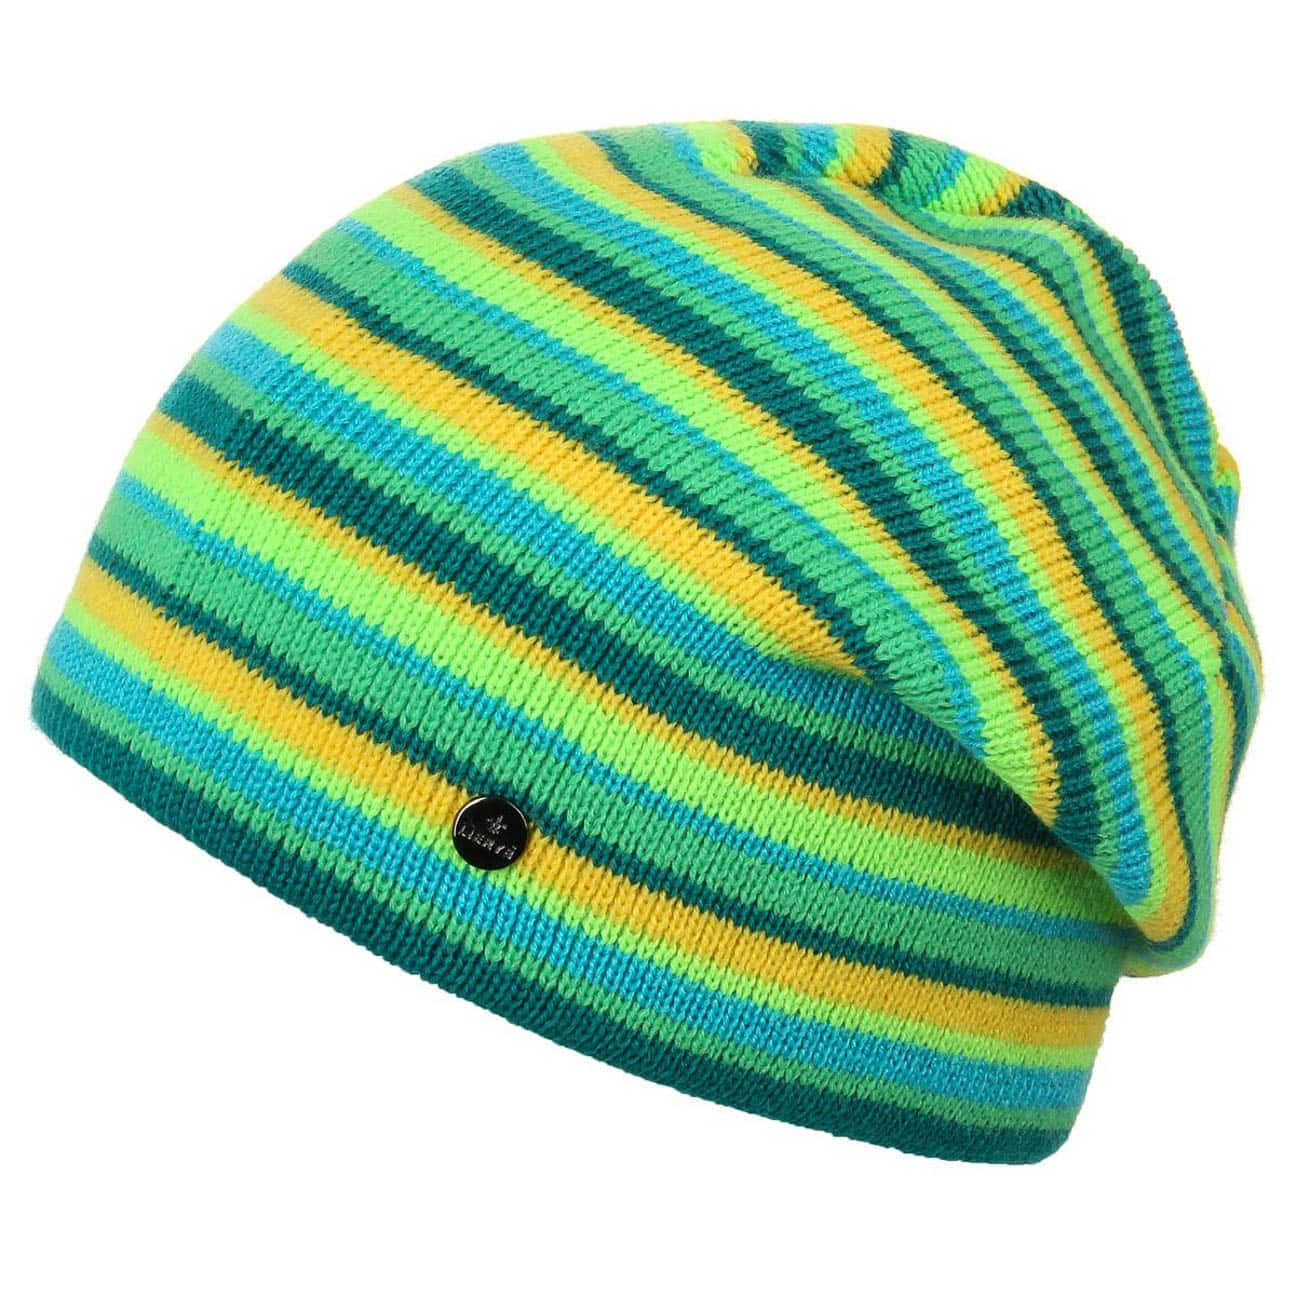 Coloured Stripes Beanie by Lierys